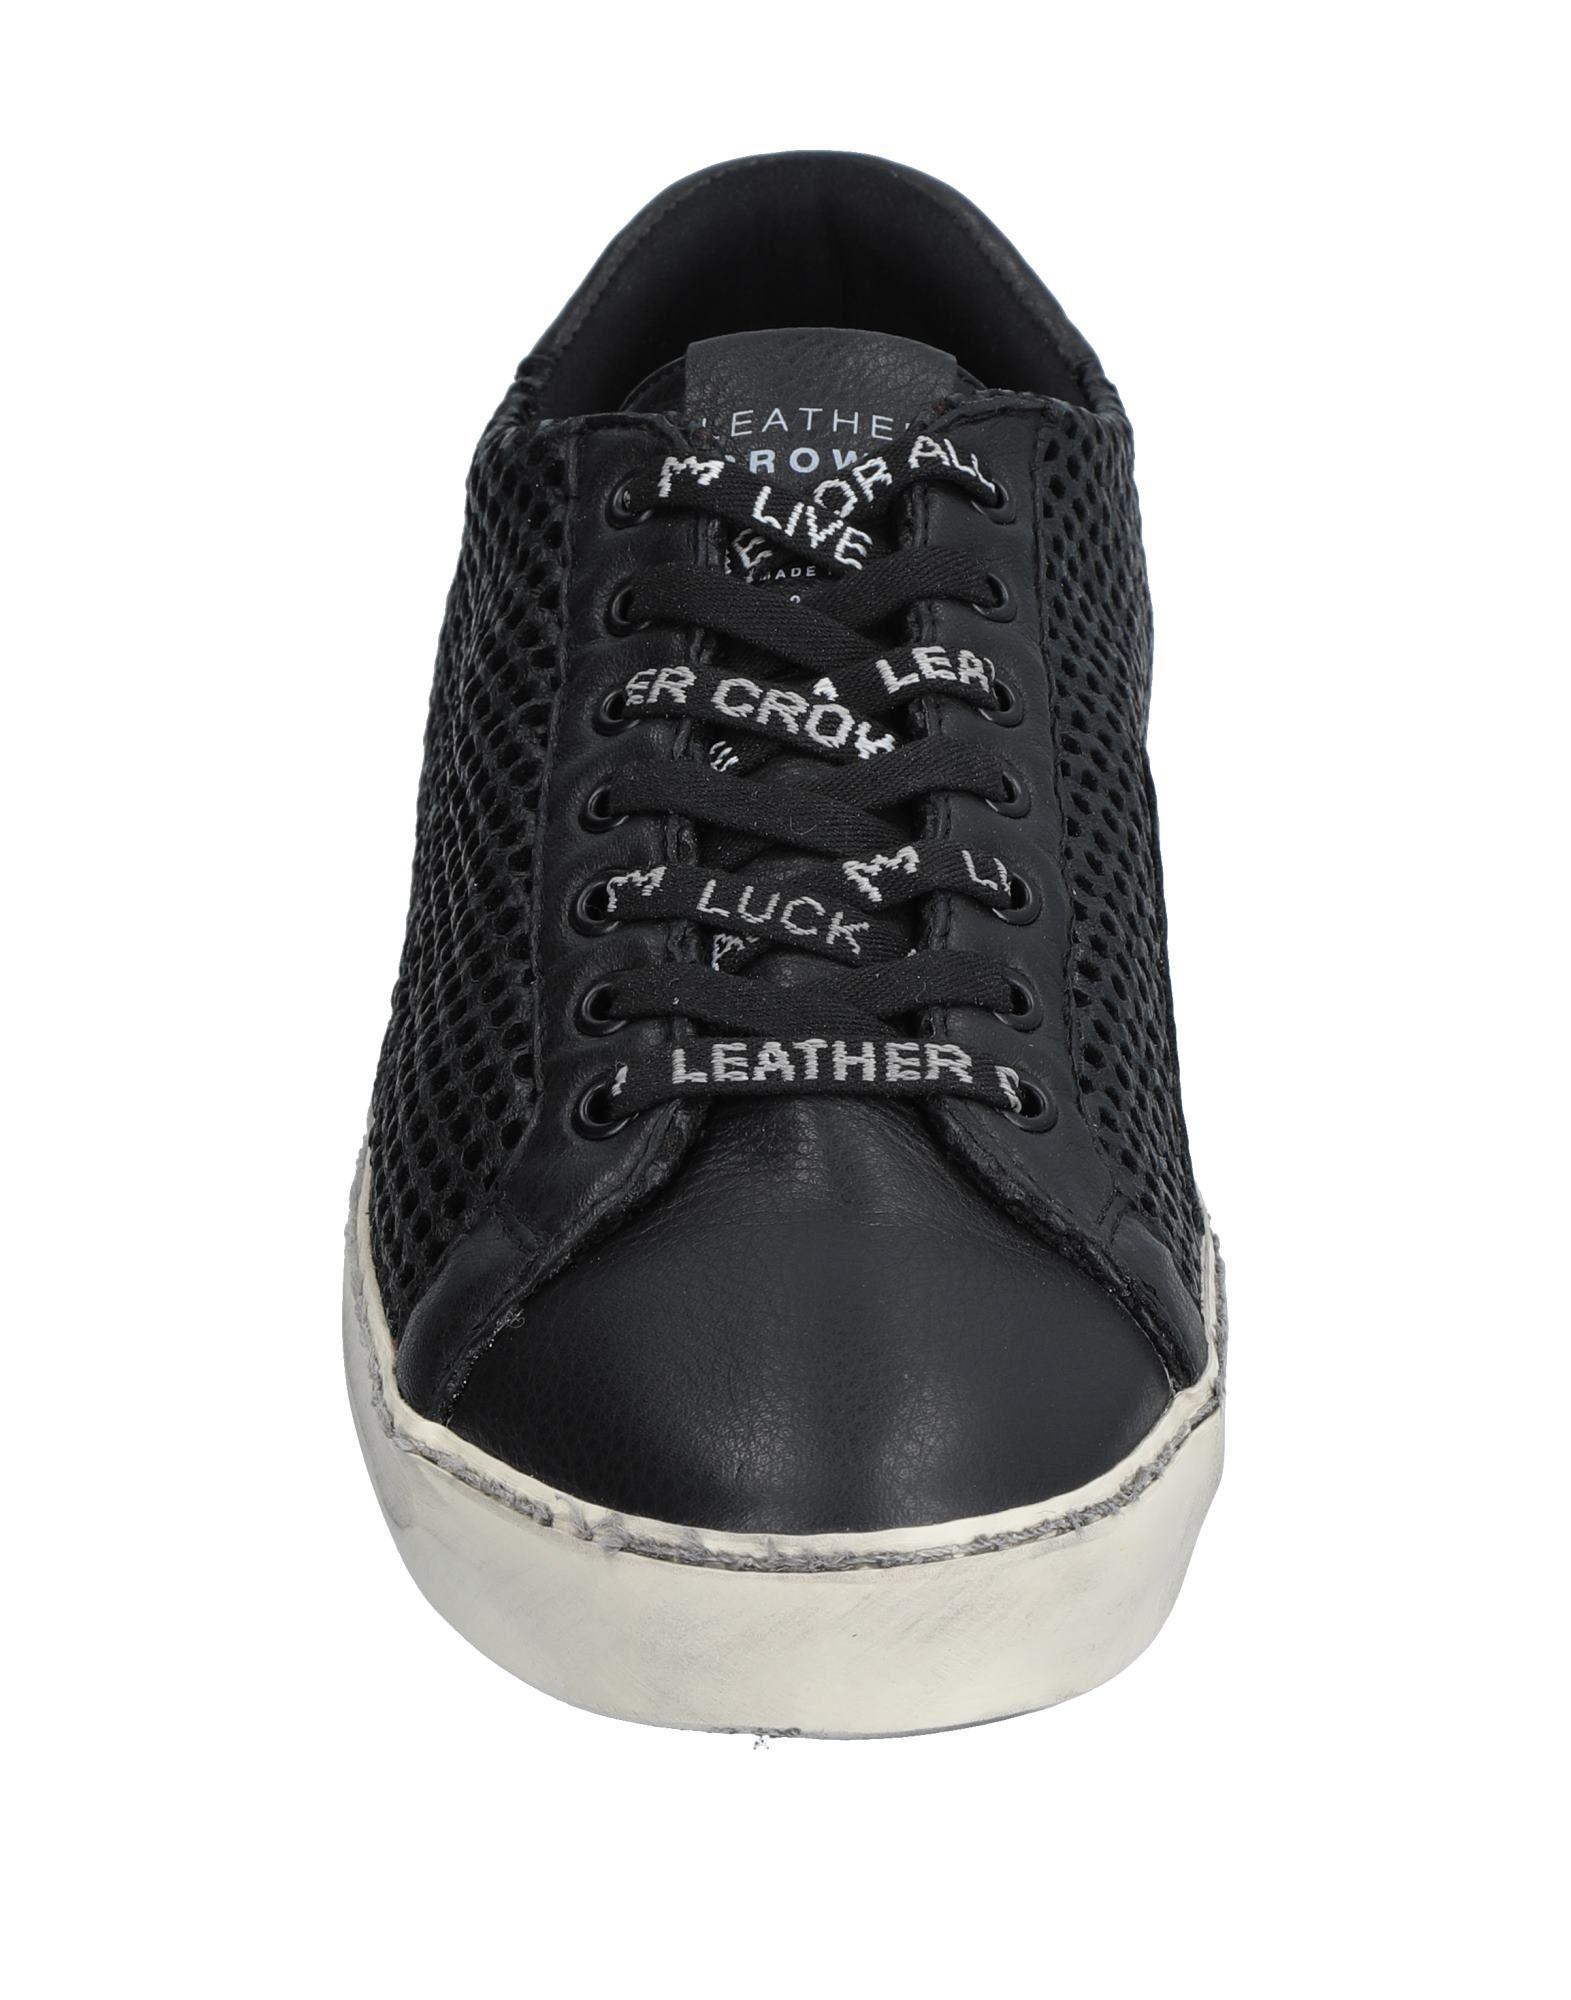 Leather Crown Sneakers Herren  11543116MN Gute Qualität beliebte Schuhe